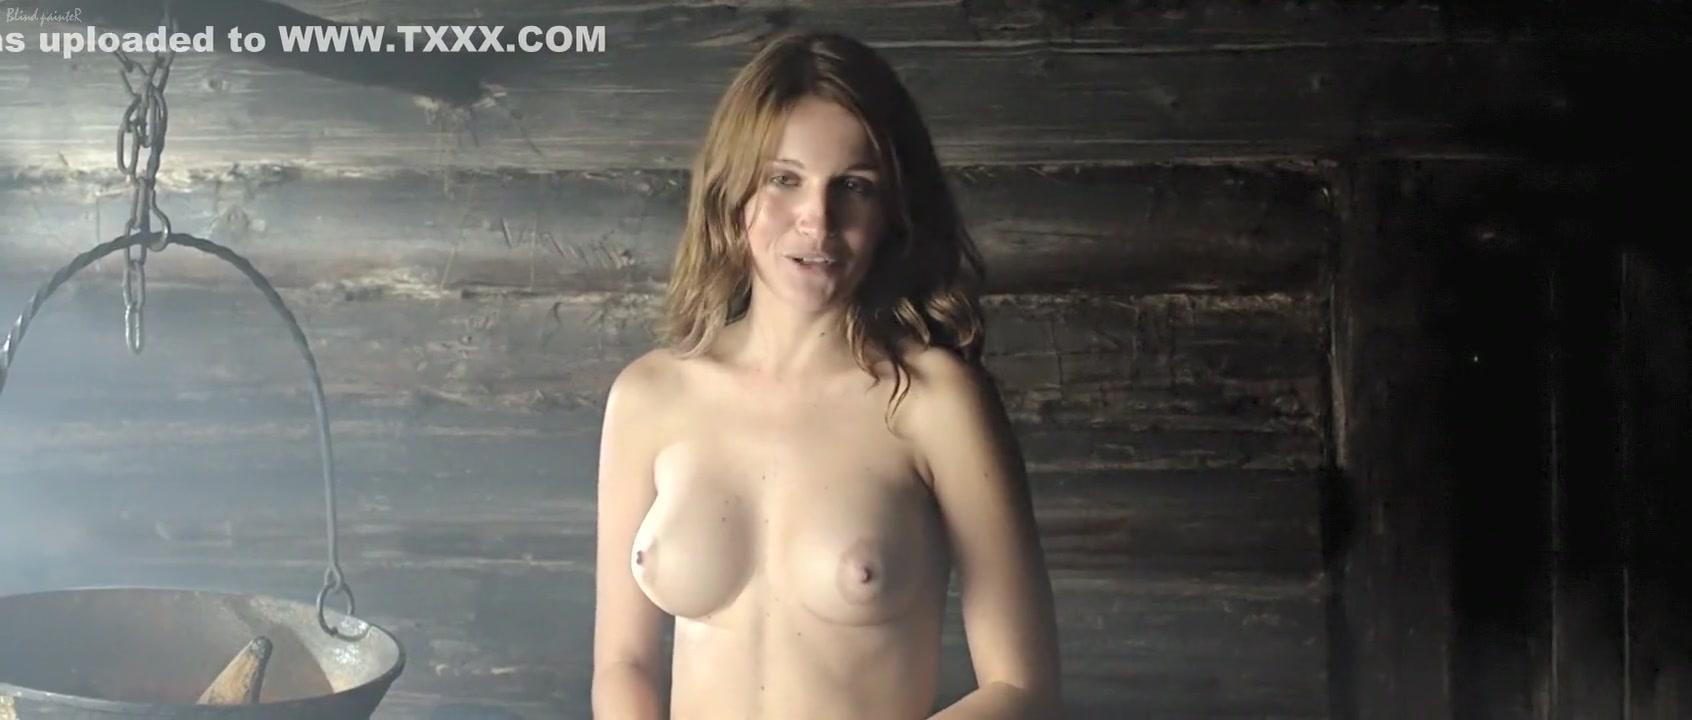 Porn Pics & Movies Free online threesome